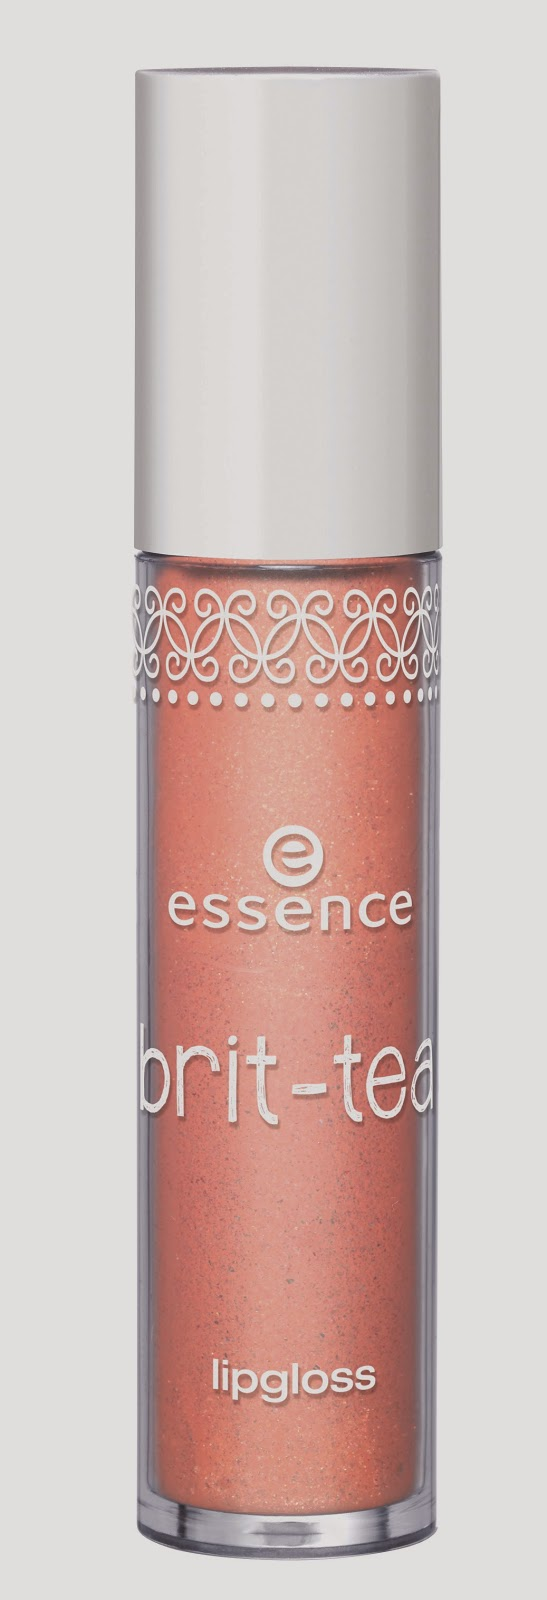 essence brit-tea – lipgloss - www.annitschkasbloge.de